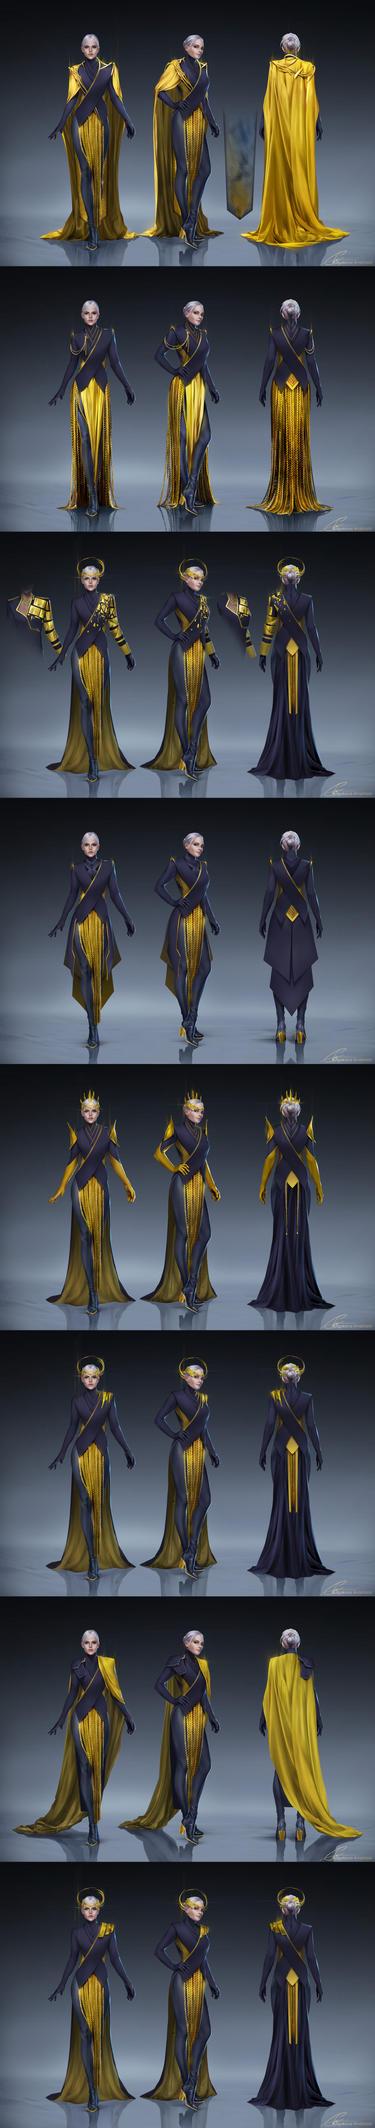 Costume design (Valerian) by Sinto-risky